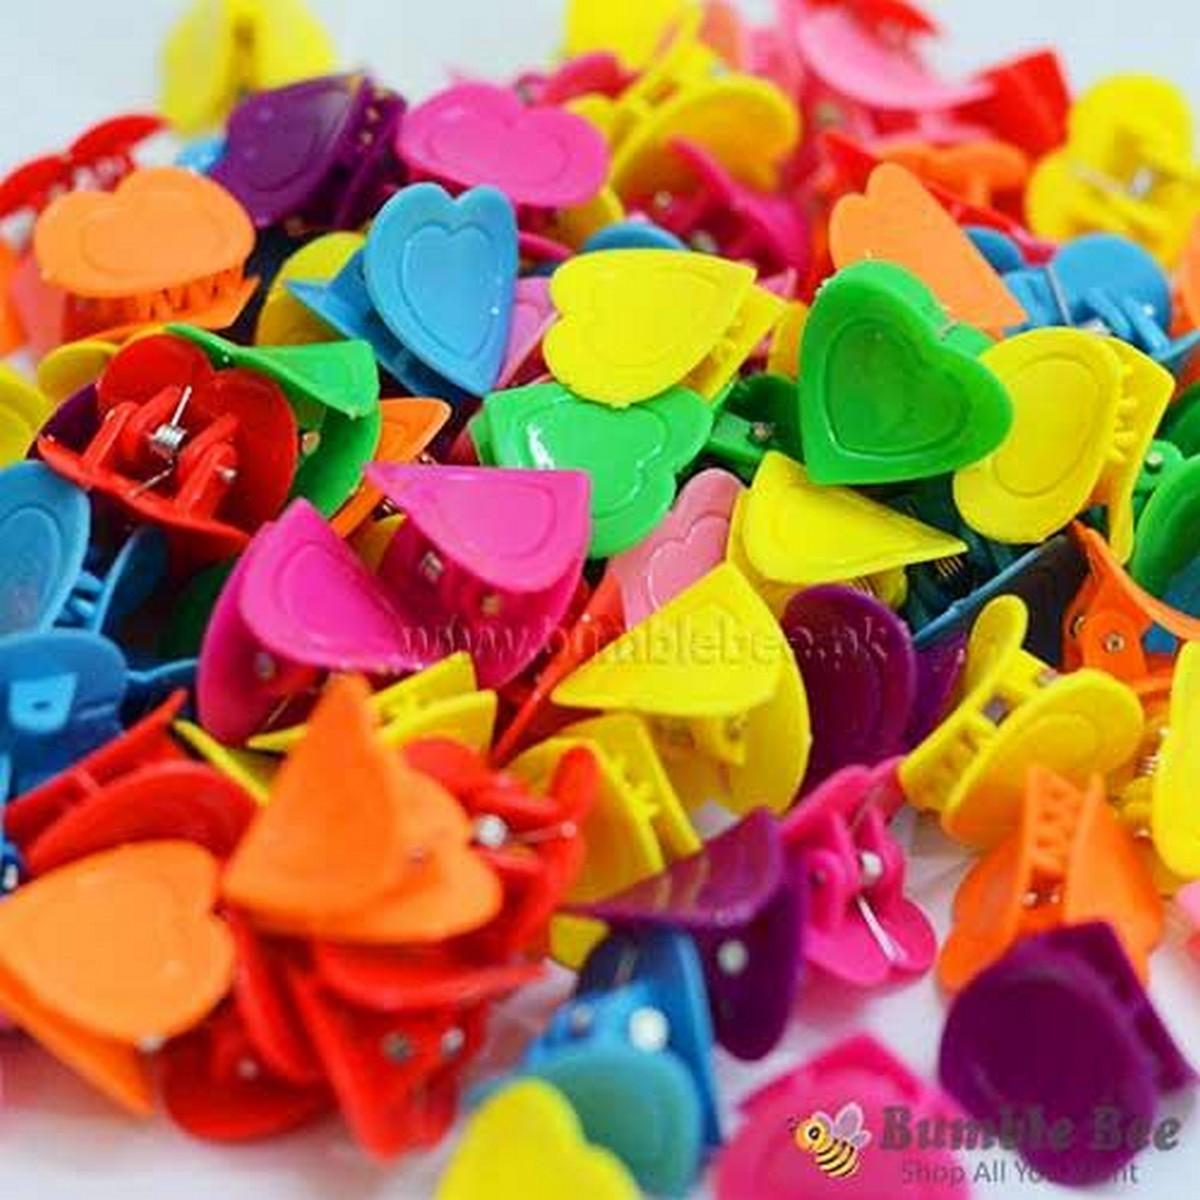 Hair Clips for Girls (kids) Heart Shape Clips Beautiful (pack of 10 Clips) (Heart Shape Hair Clips) (Hair Pins)